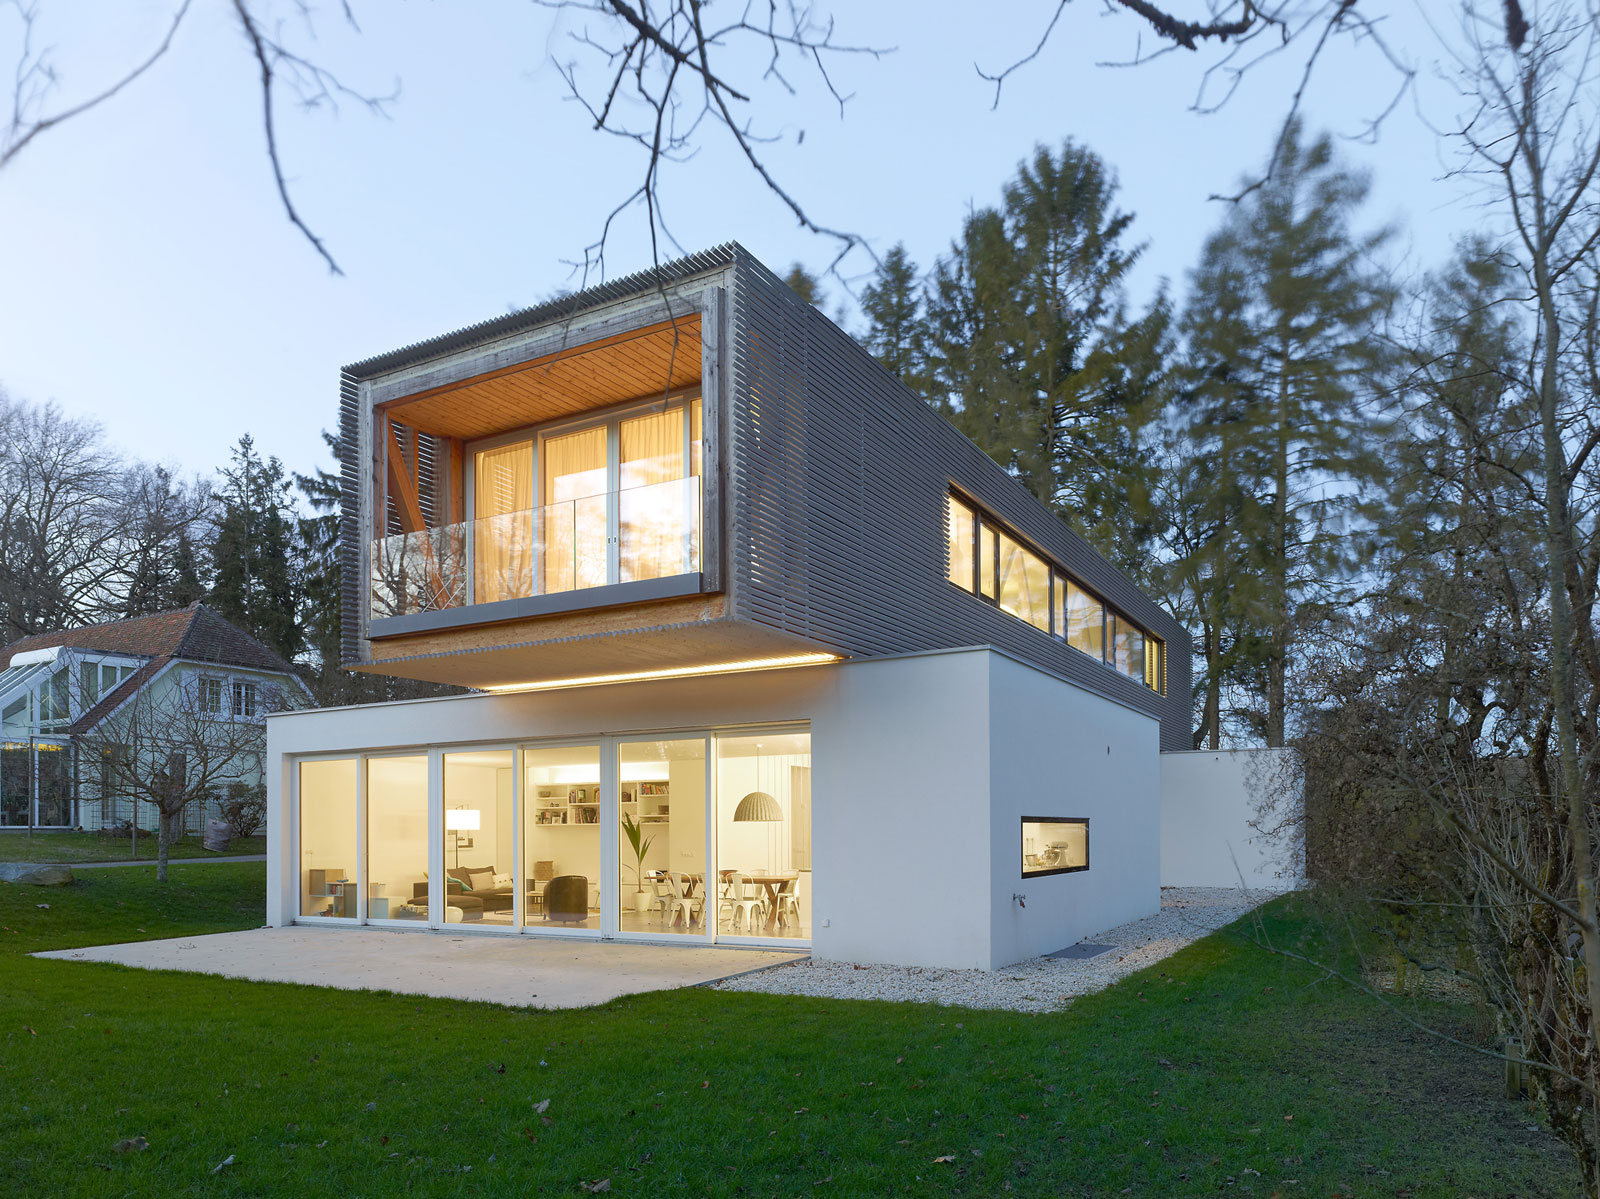 Minergie Villa Christian von Düring architecte-26